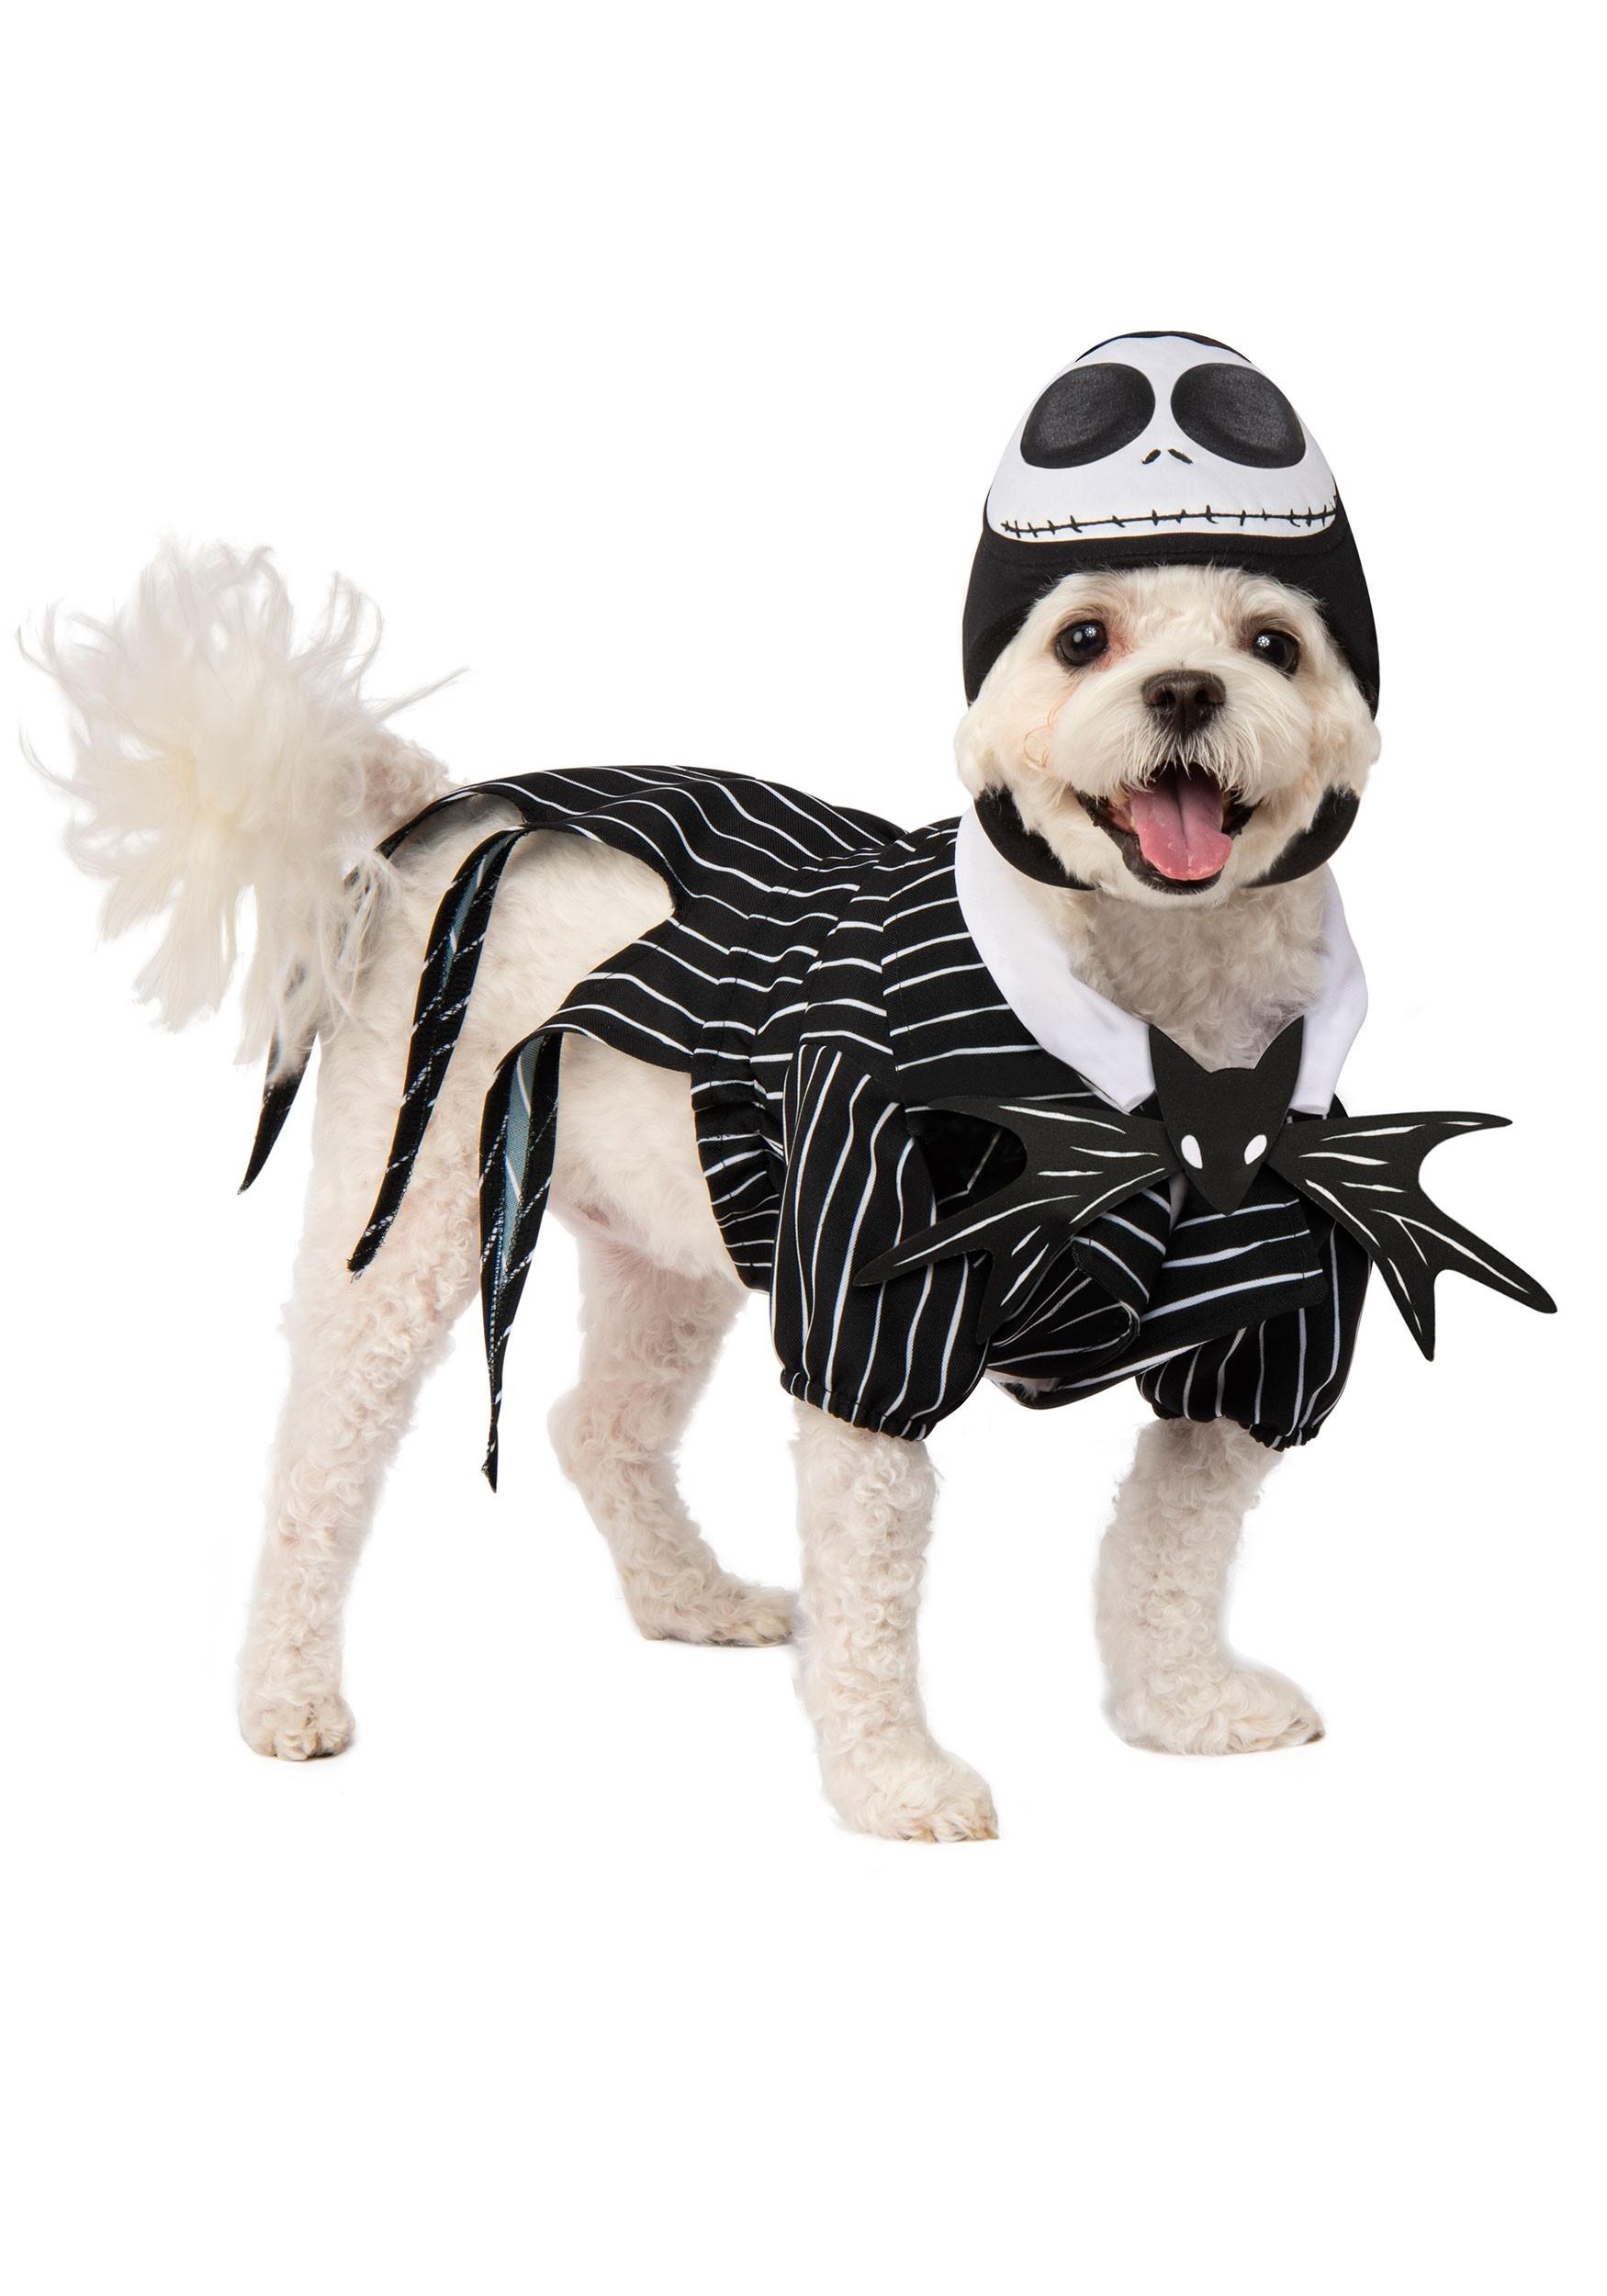 Nightmare Before Christmas Jack Skellington Pet Costume